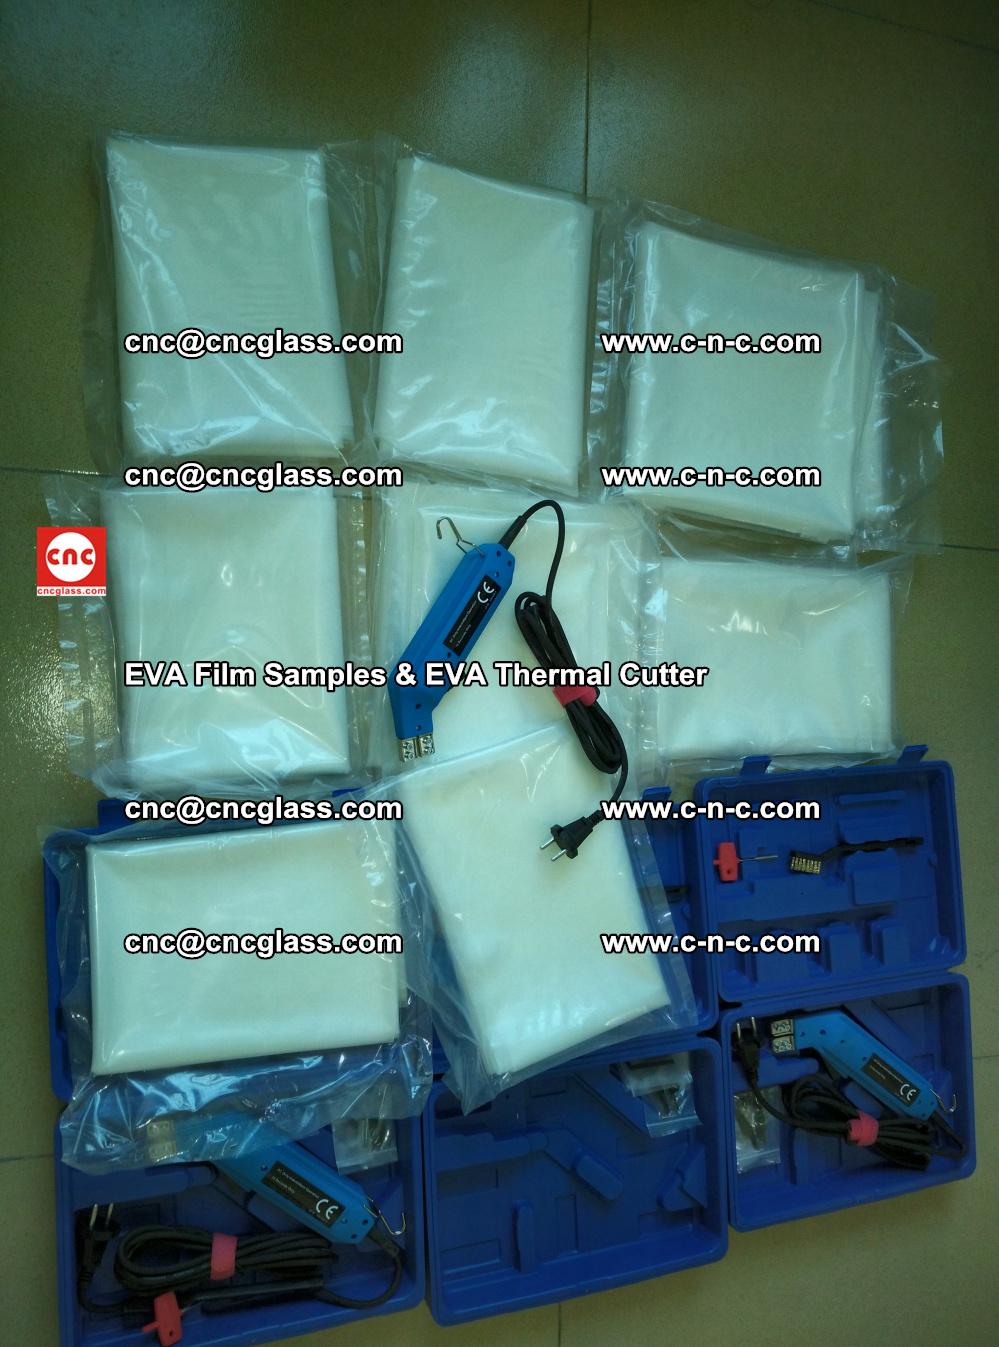 EVAFORCE SUPER CLEAR EVA Film Samples and EVA Thermal Cutter (4)